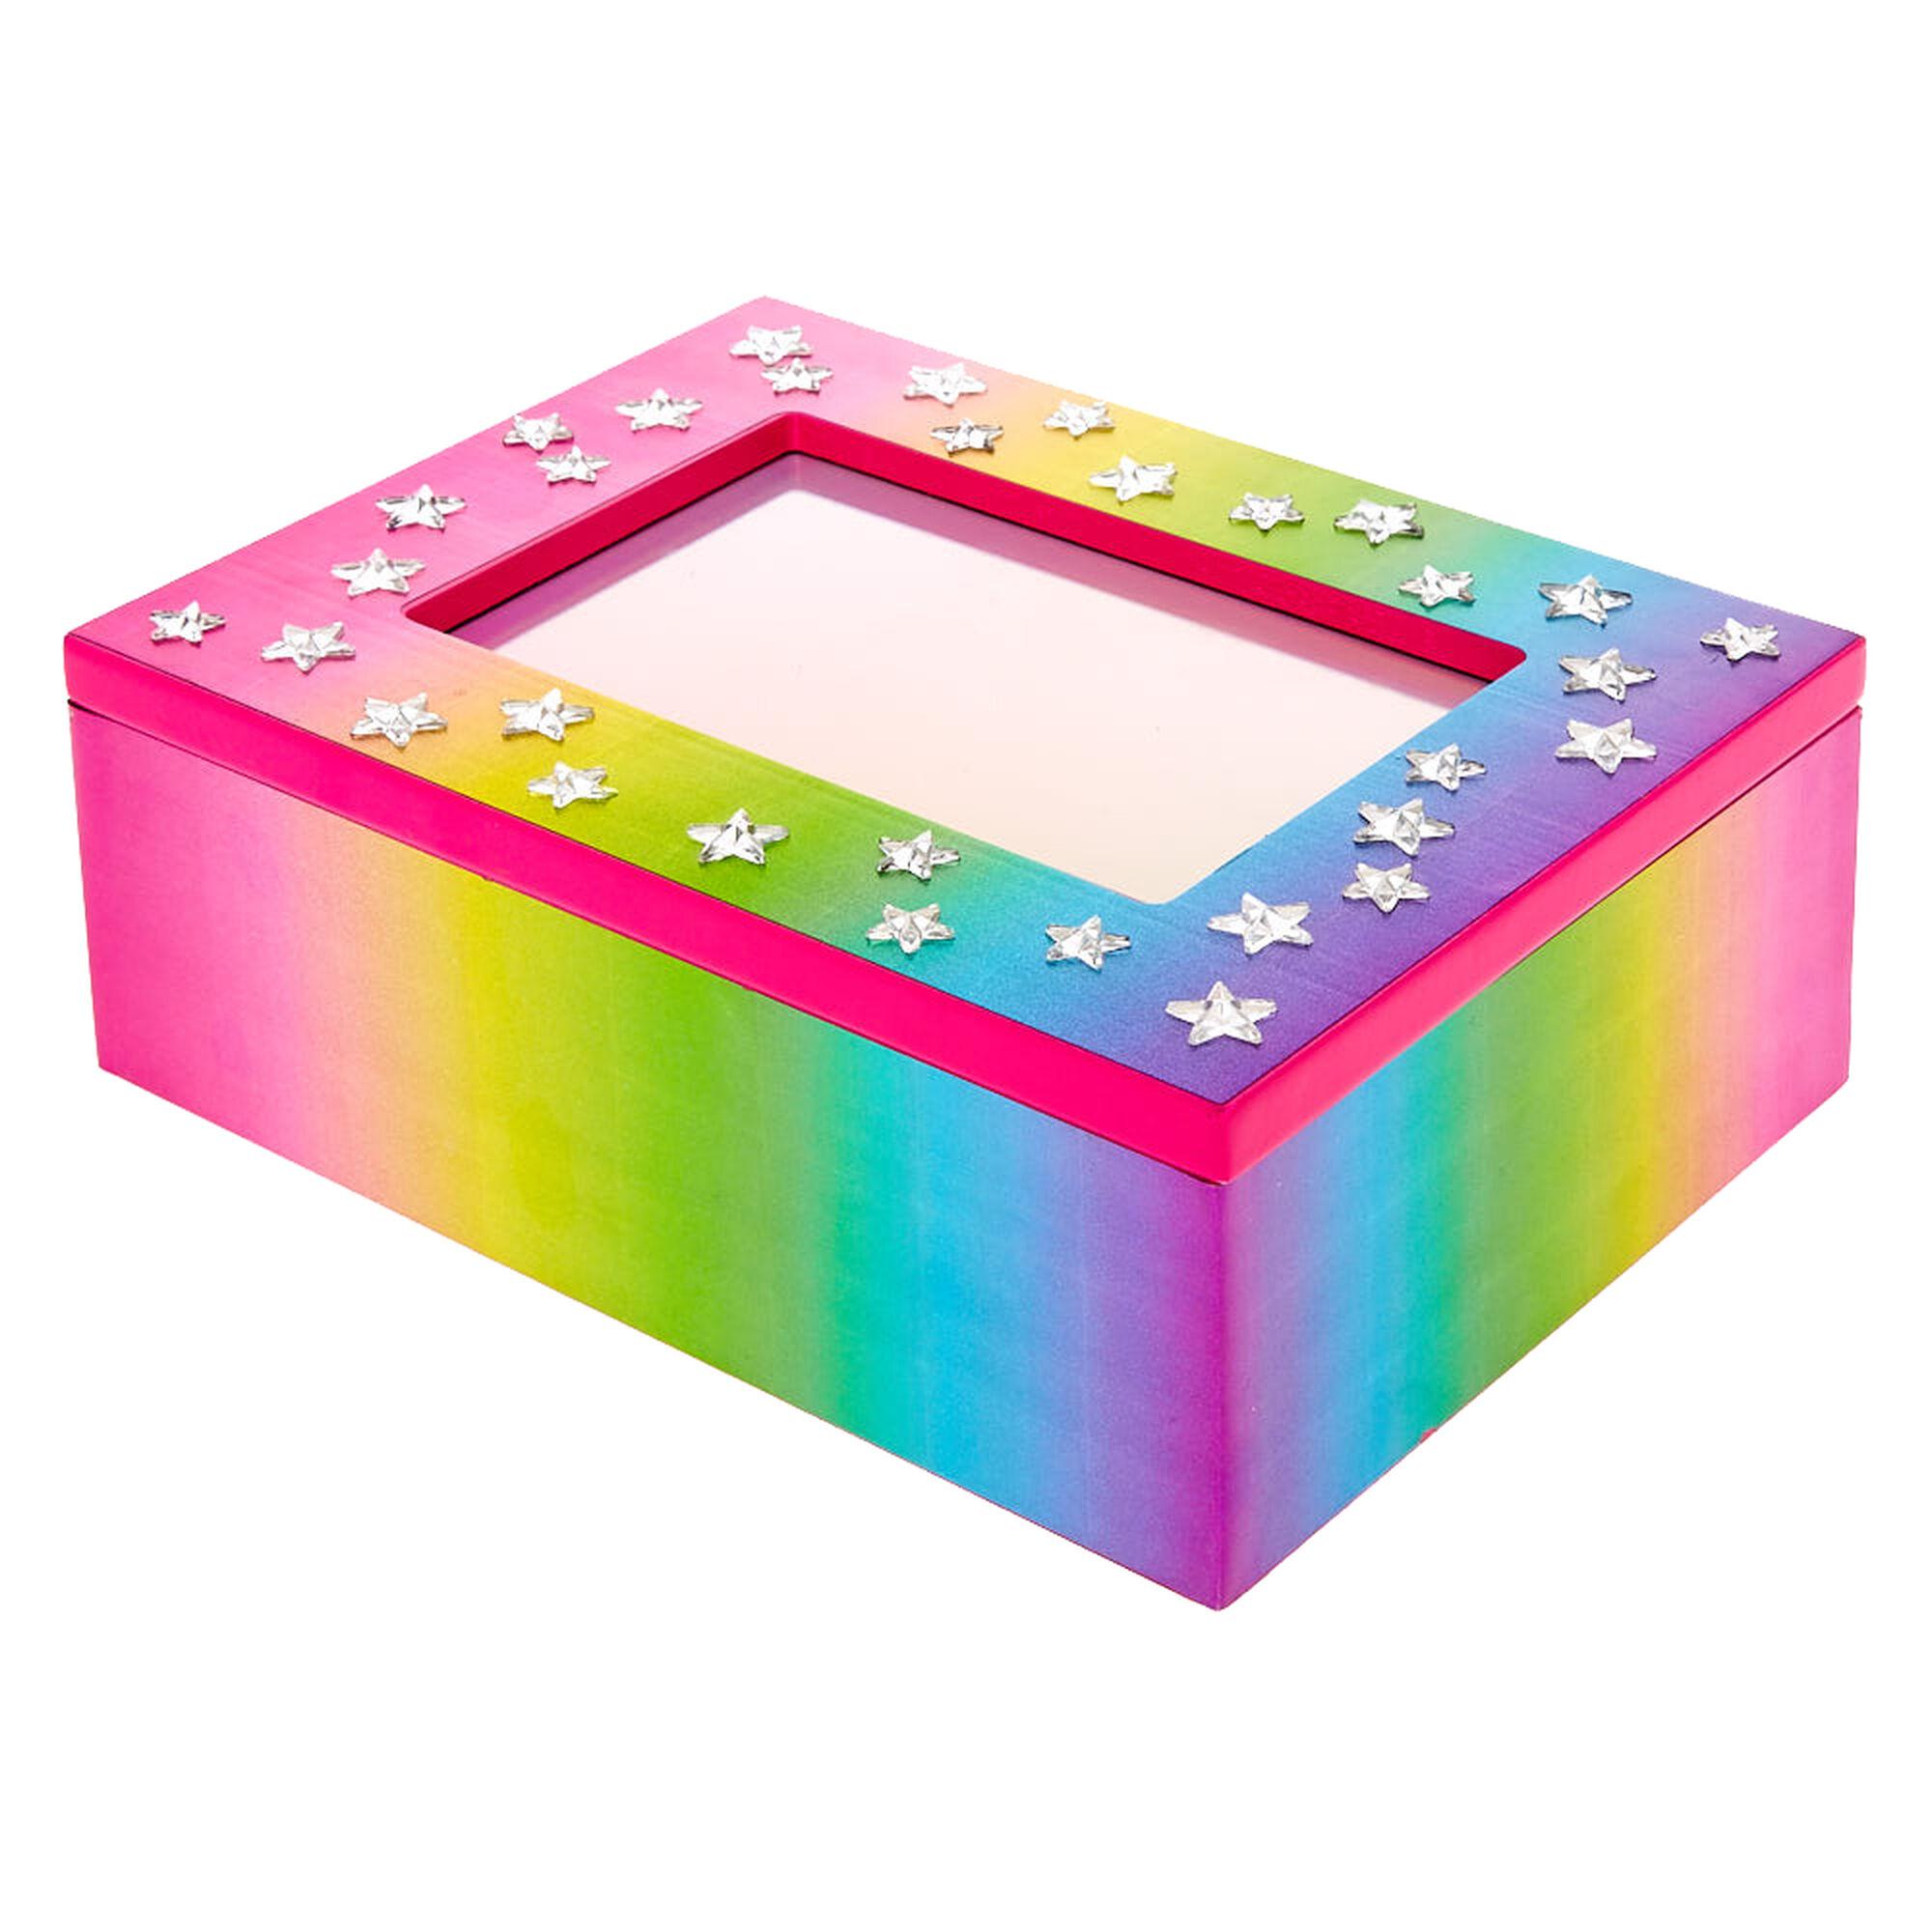 S Kids Gem Jewelry Box